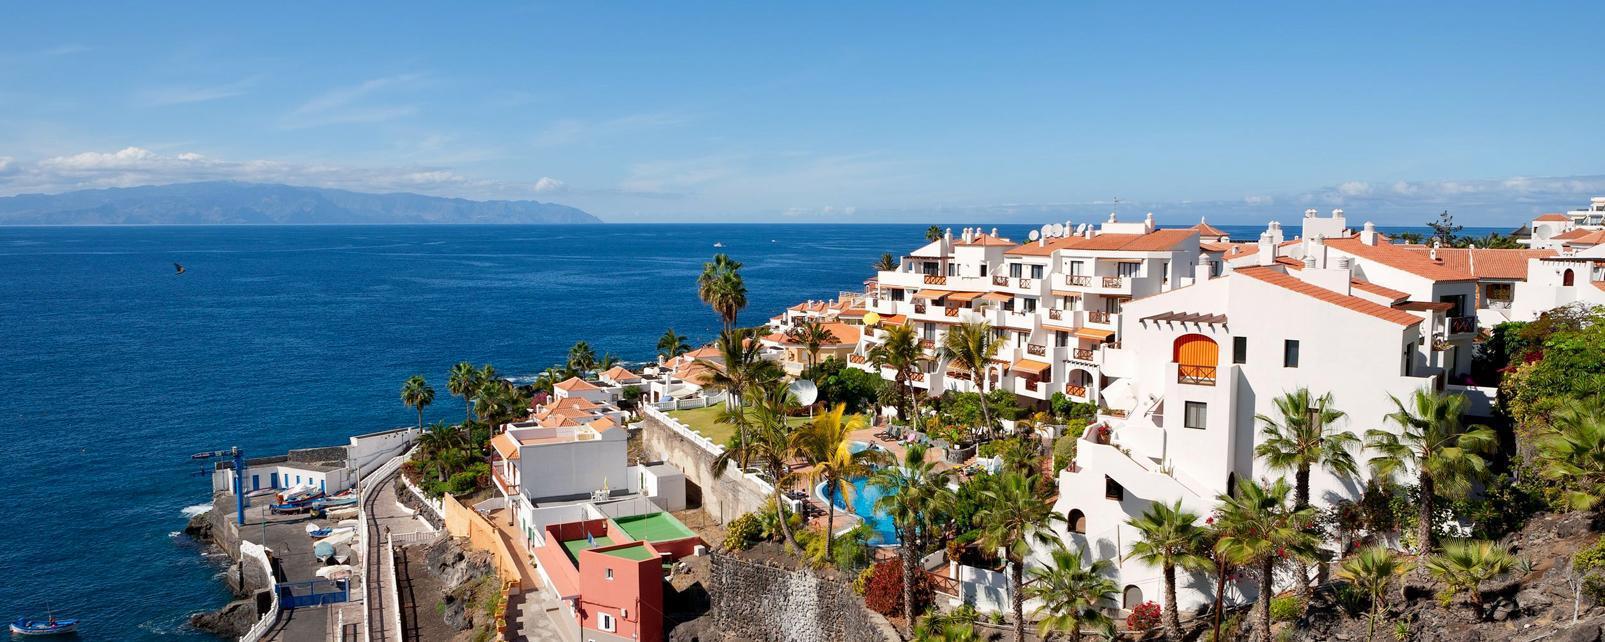 Puerto De Santiago Teneriffa Hotels